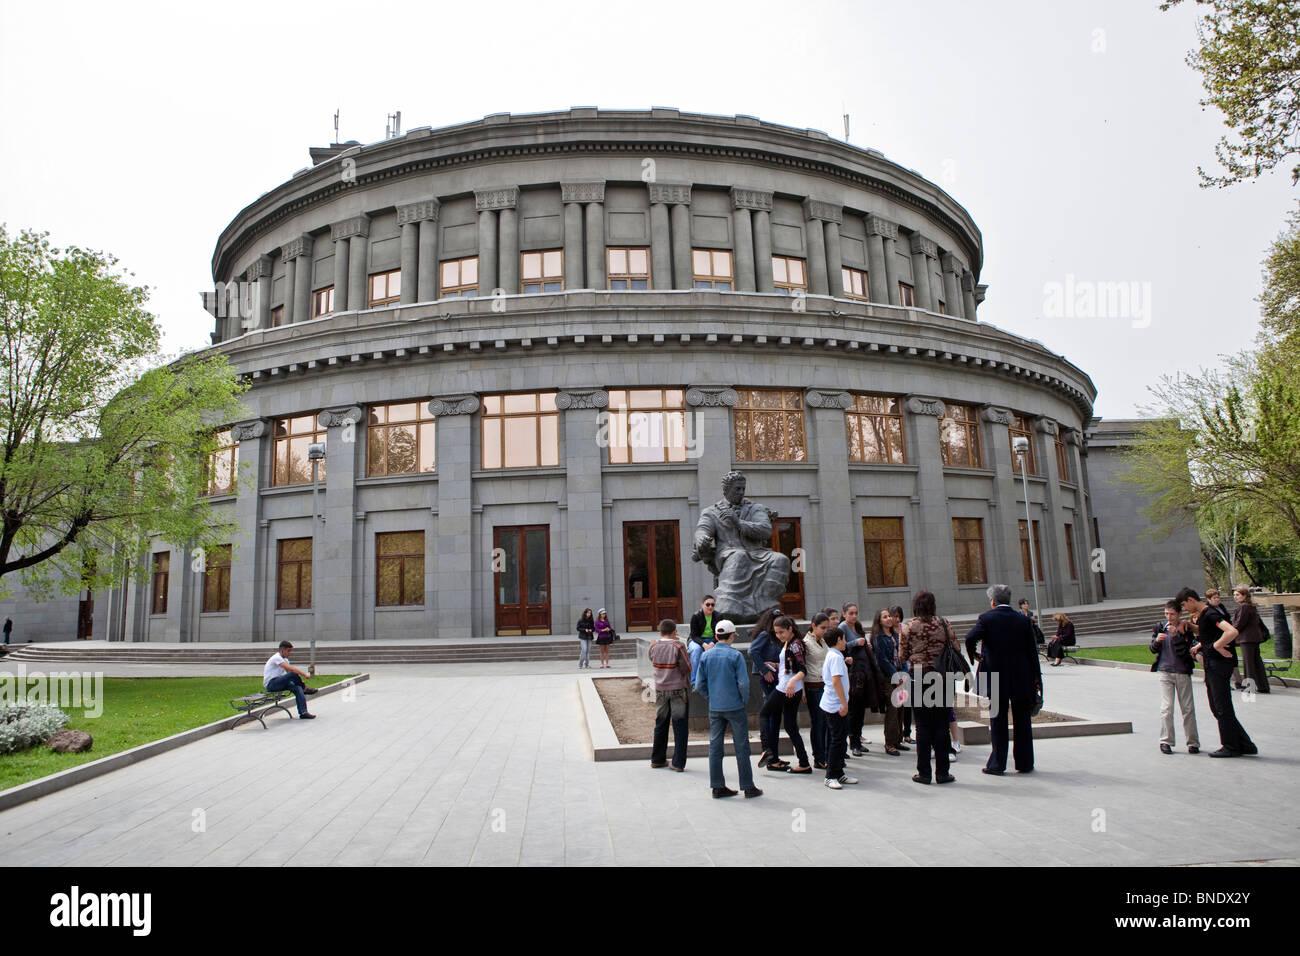 Opera House, concert hall, Yerevan, Arménia Imagens de Stock